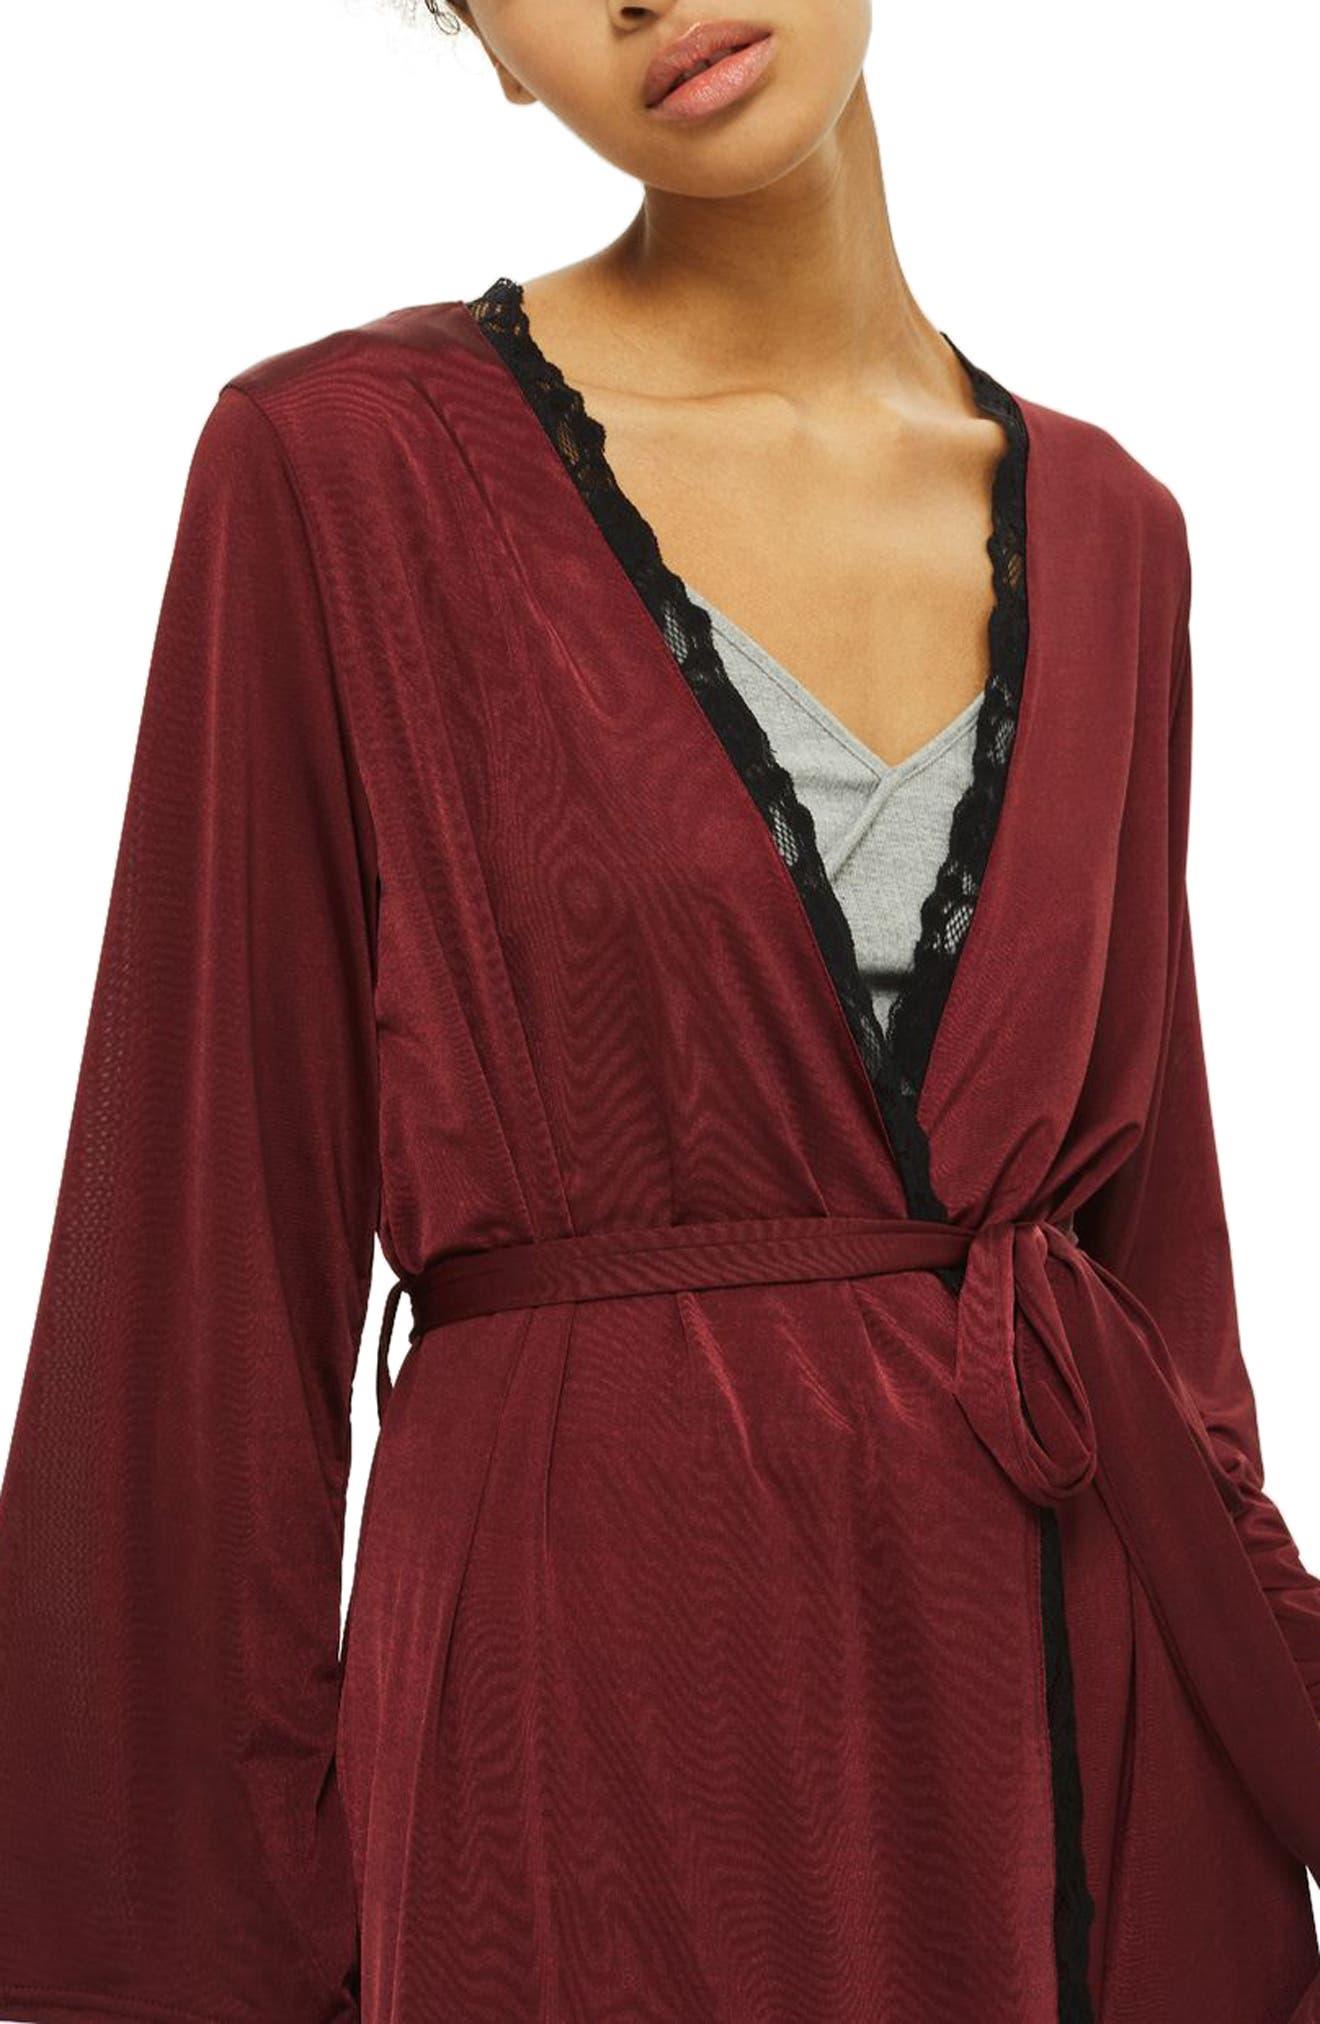 Satin Jersey Robe,                             Alternate thumbnail 3, color,                             Berry Multi